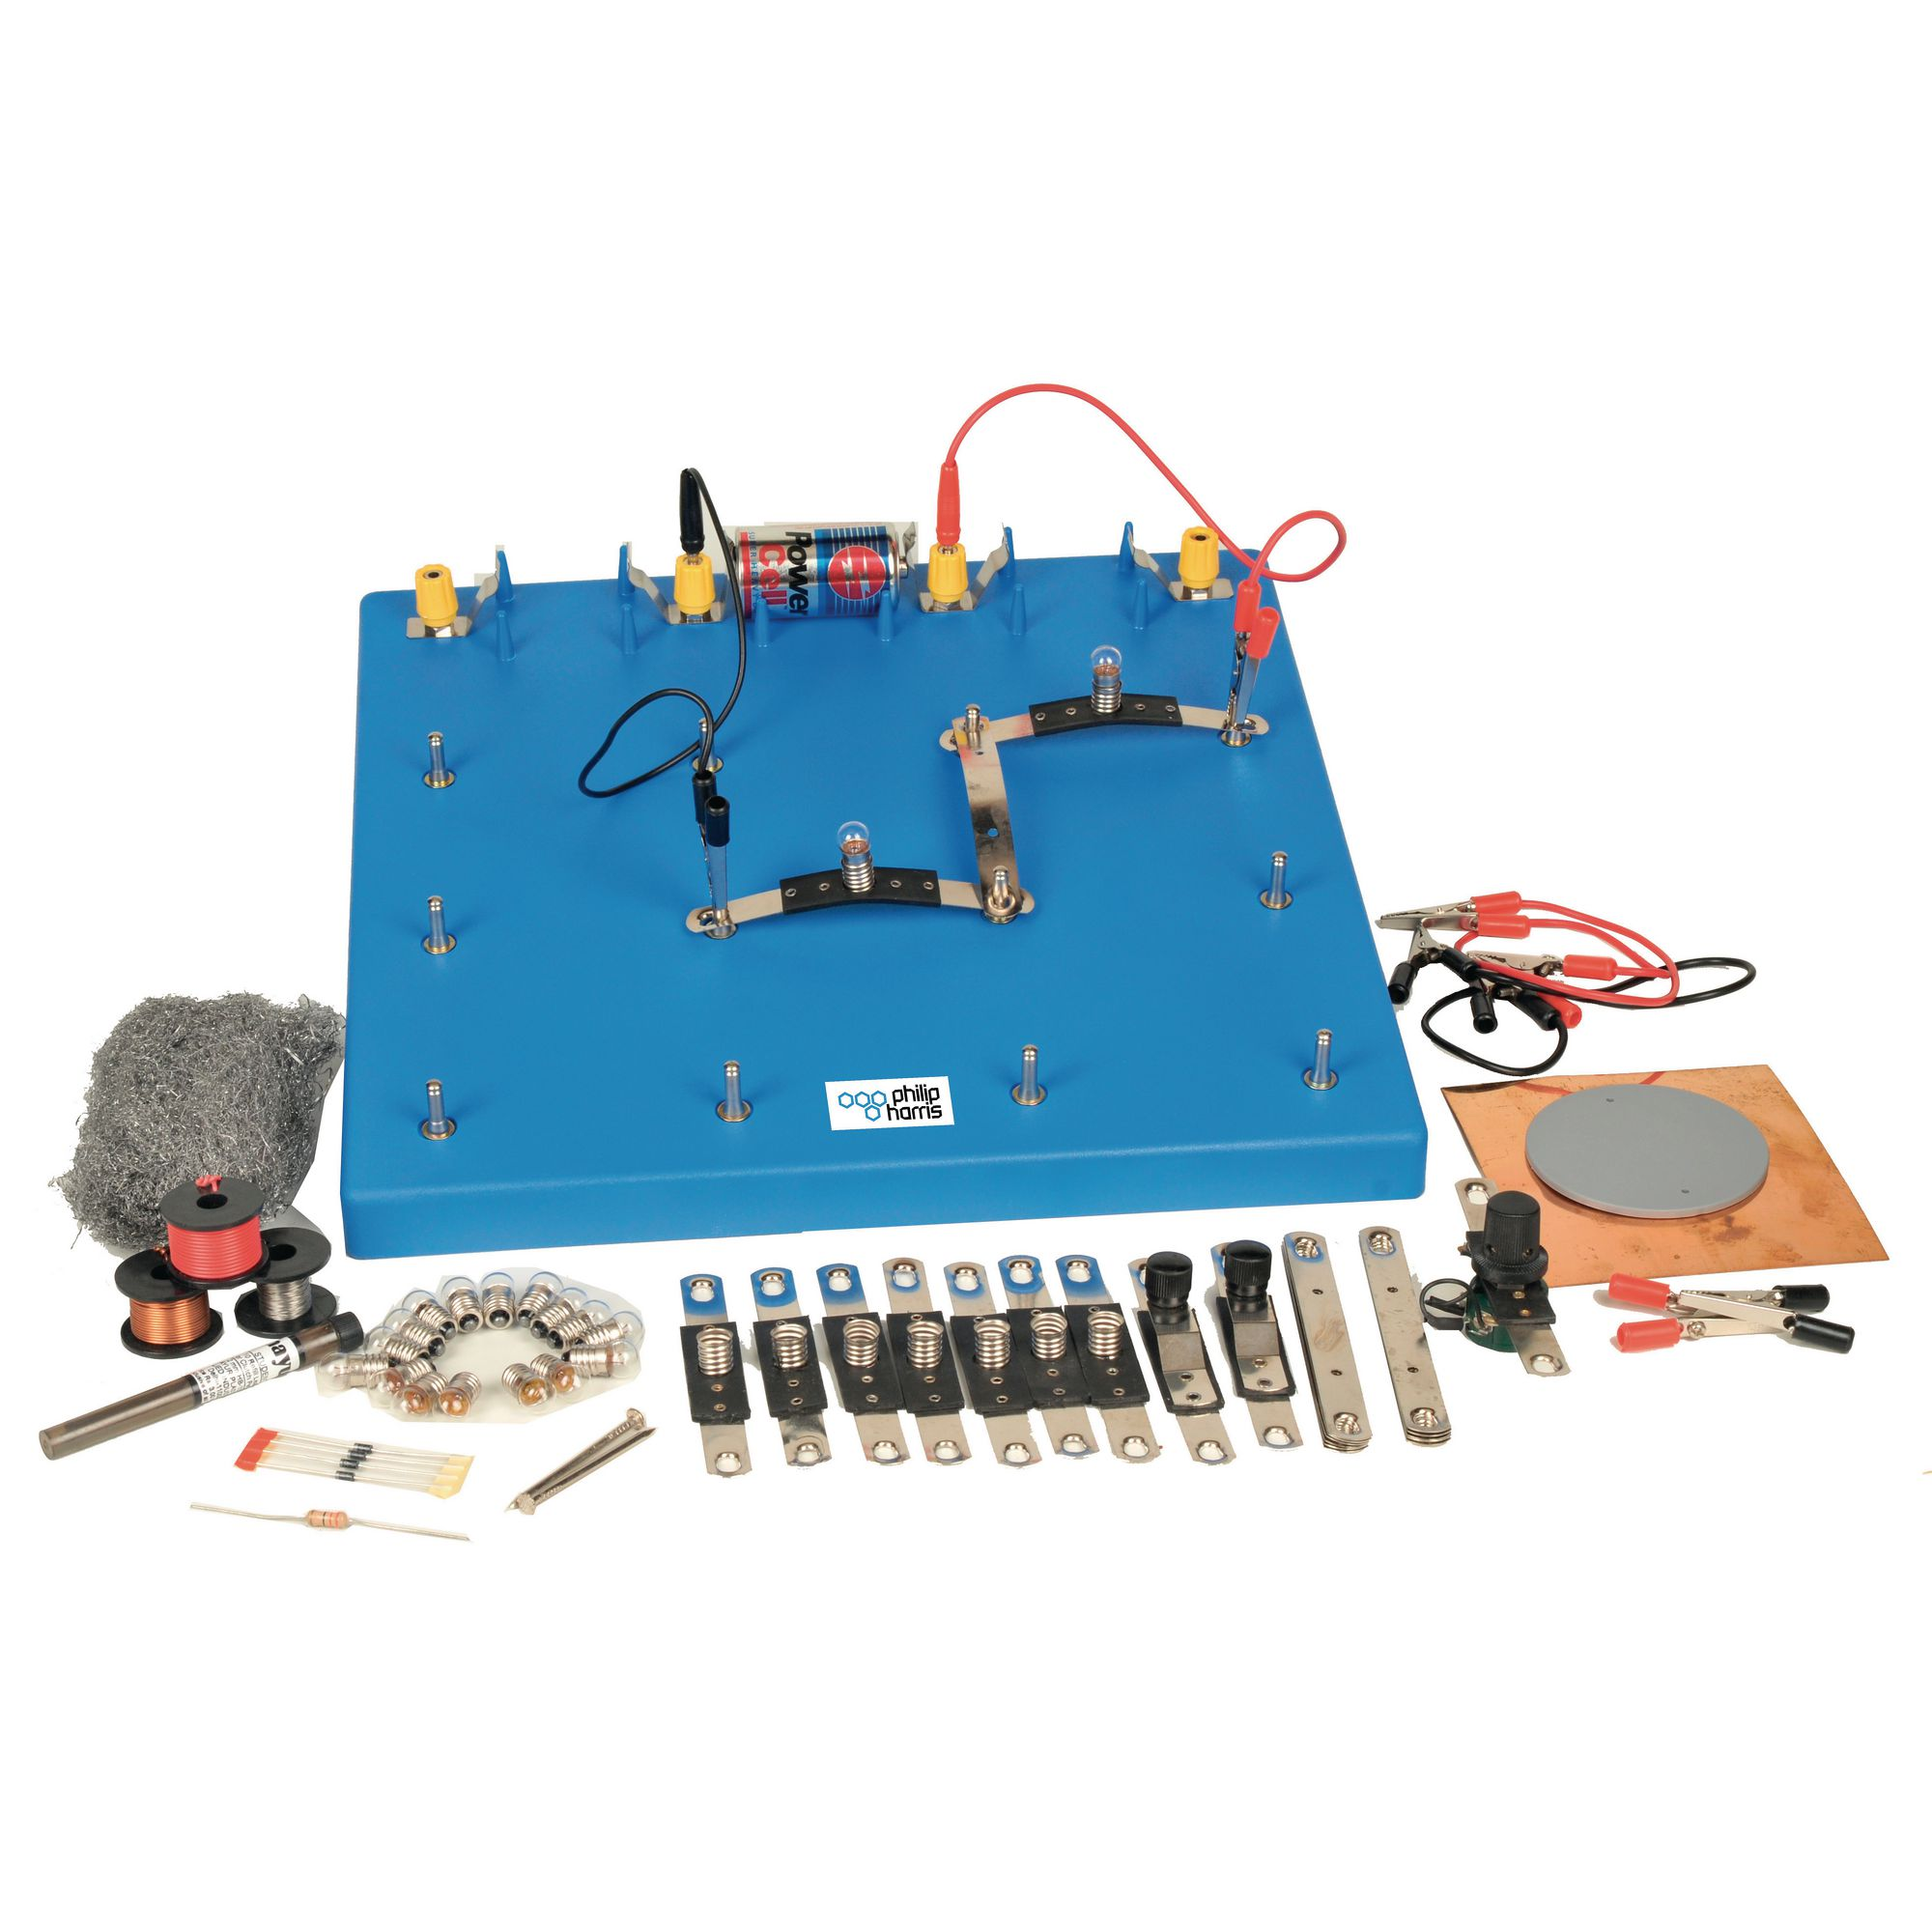 Circuit Kit Squishy Circuits Deluxe Robotshop Harris Worcester Board 1600x1600